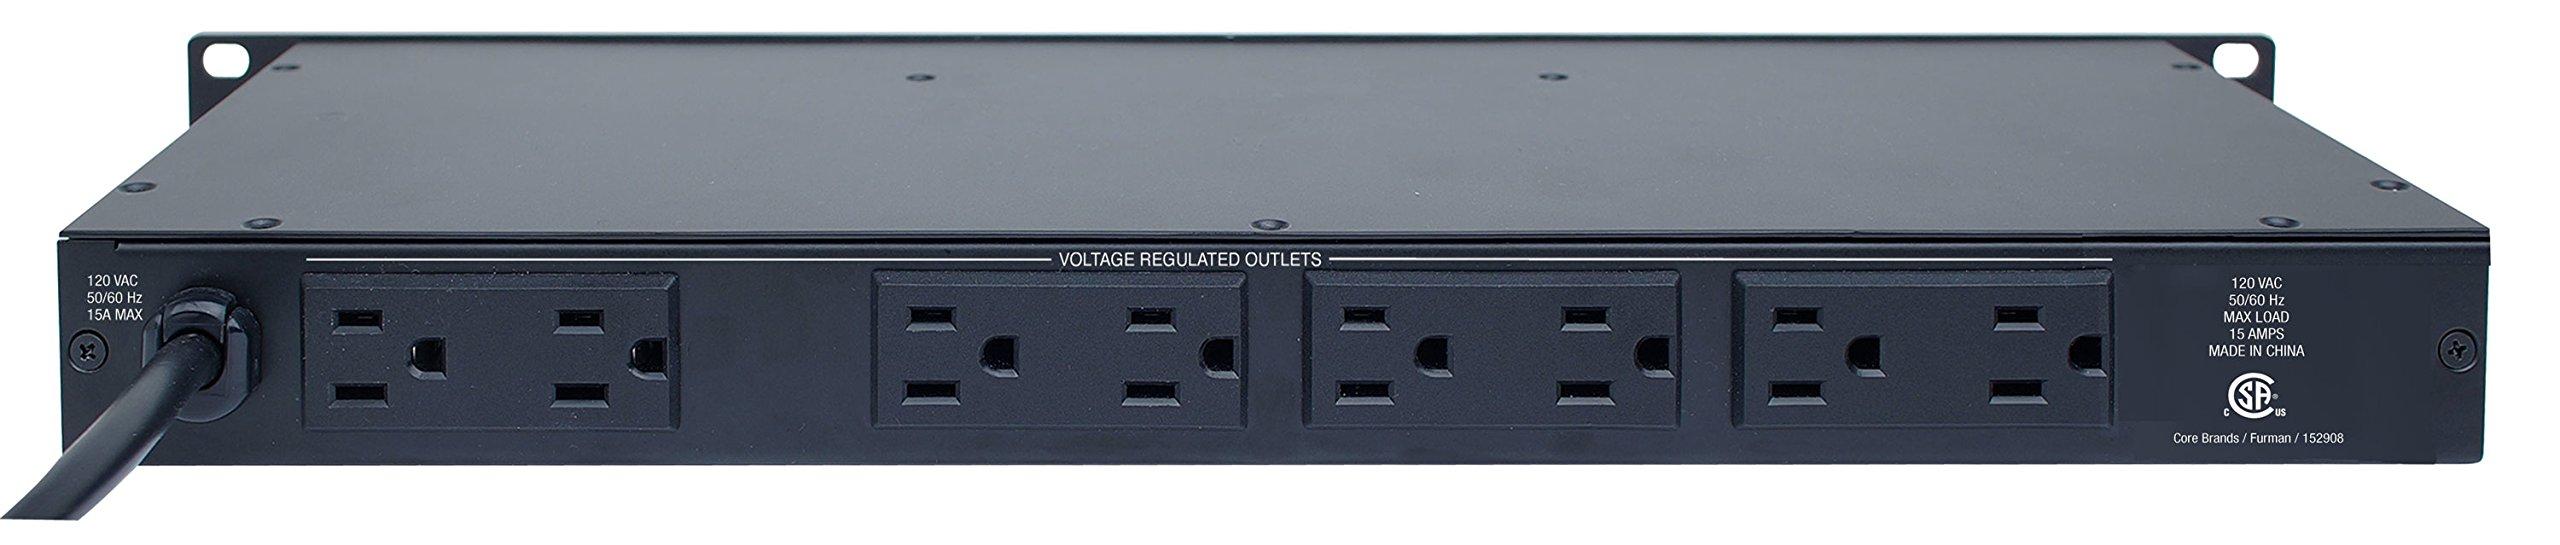 Furman M-8X AR Standard Level Voltage Regulator, Power Conditioner, 120 Volt, 15 Amp by Furman (Image #2)